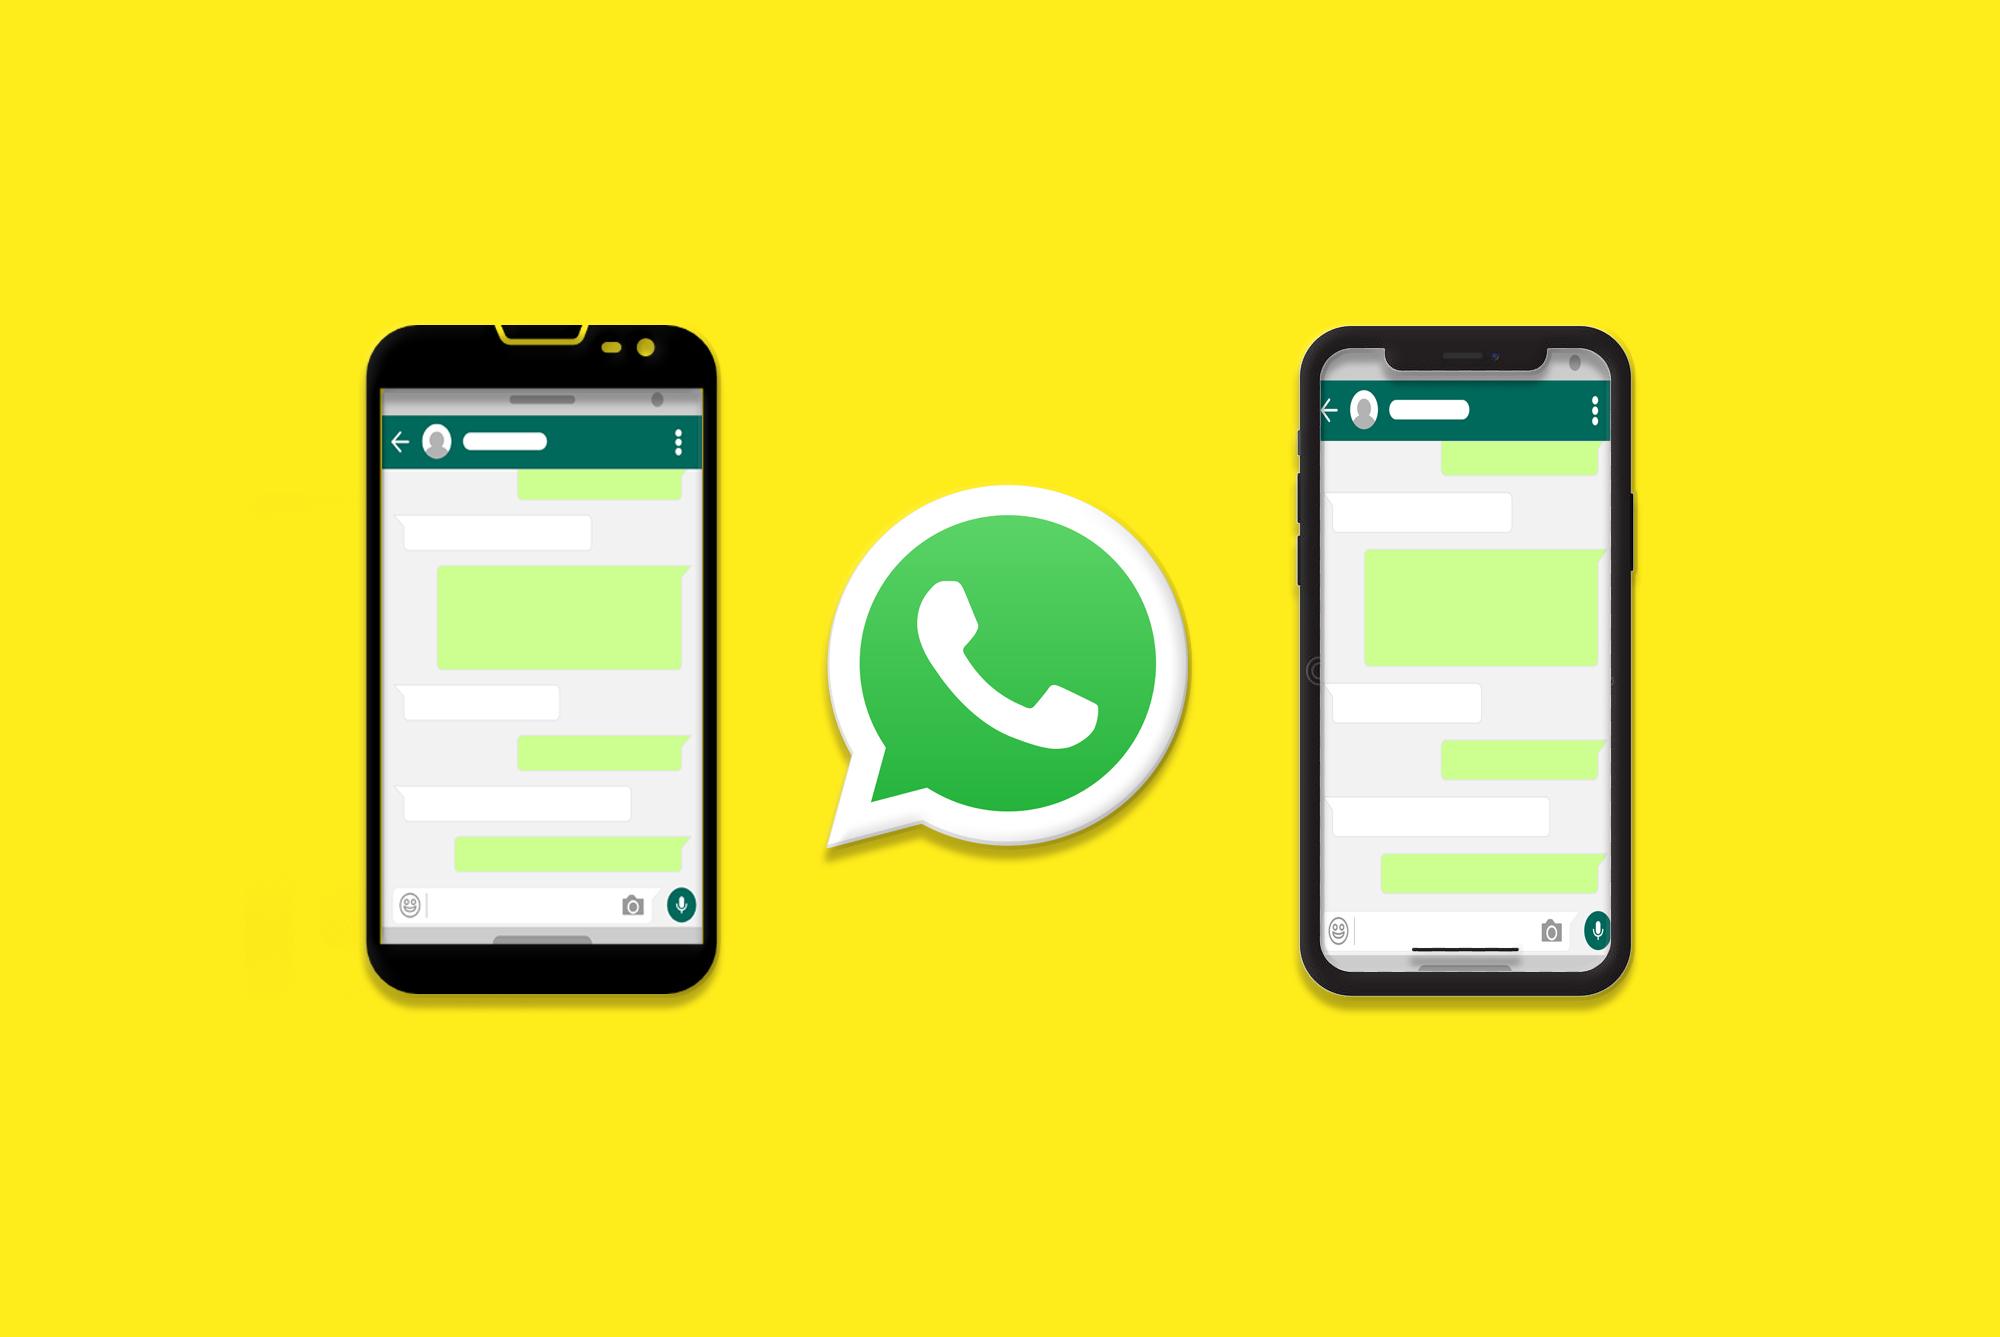 Chatear por WhatsApp desde dos teléfonos a la vez es posible gracias a este truco.